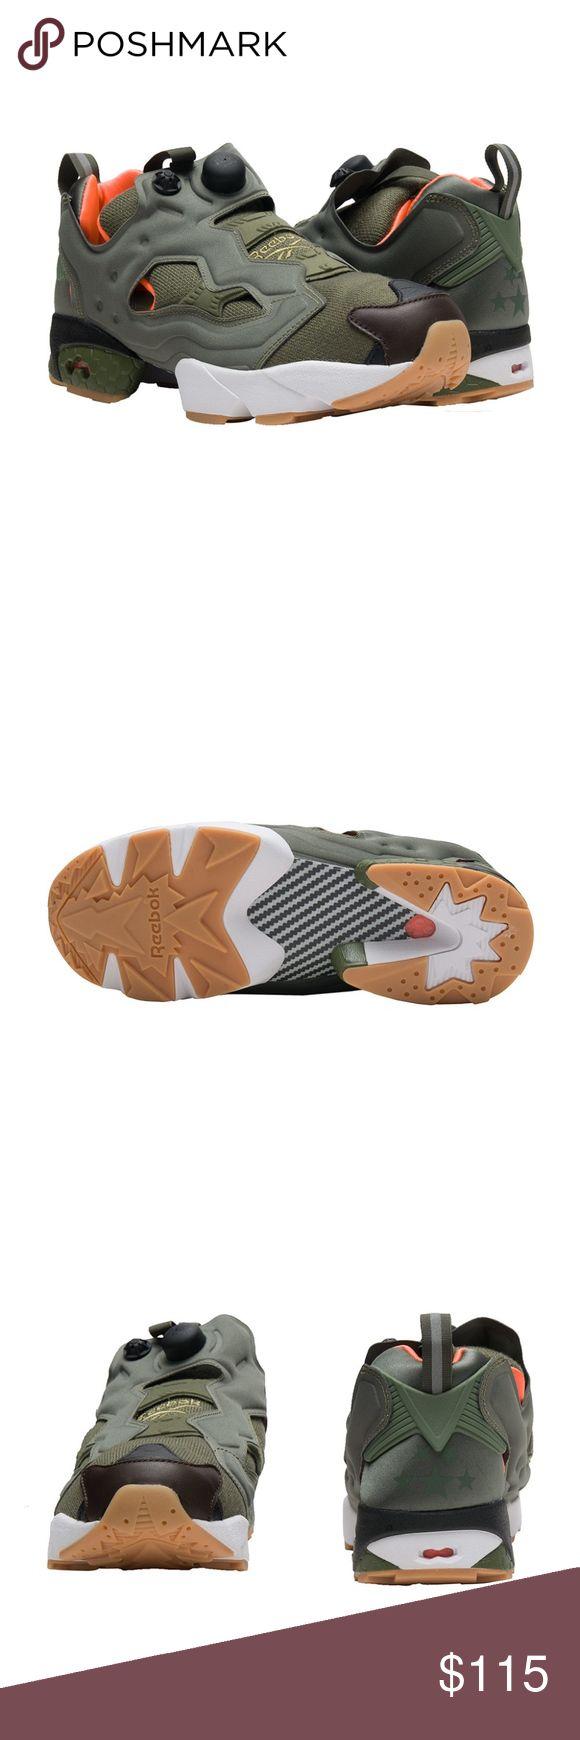 New Reebok InstaPump Fury OG Green sneakers New REEBOK  Instapump Fury OG Green sneakers.   Men's low top sneaker   Slip on construction   Heel tab for easy on/off   REEBOK logo branding   Pump cushioning  Limited sizes. Reebok Shoes Sneakers